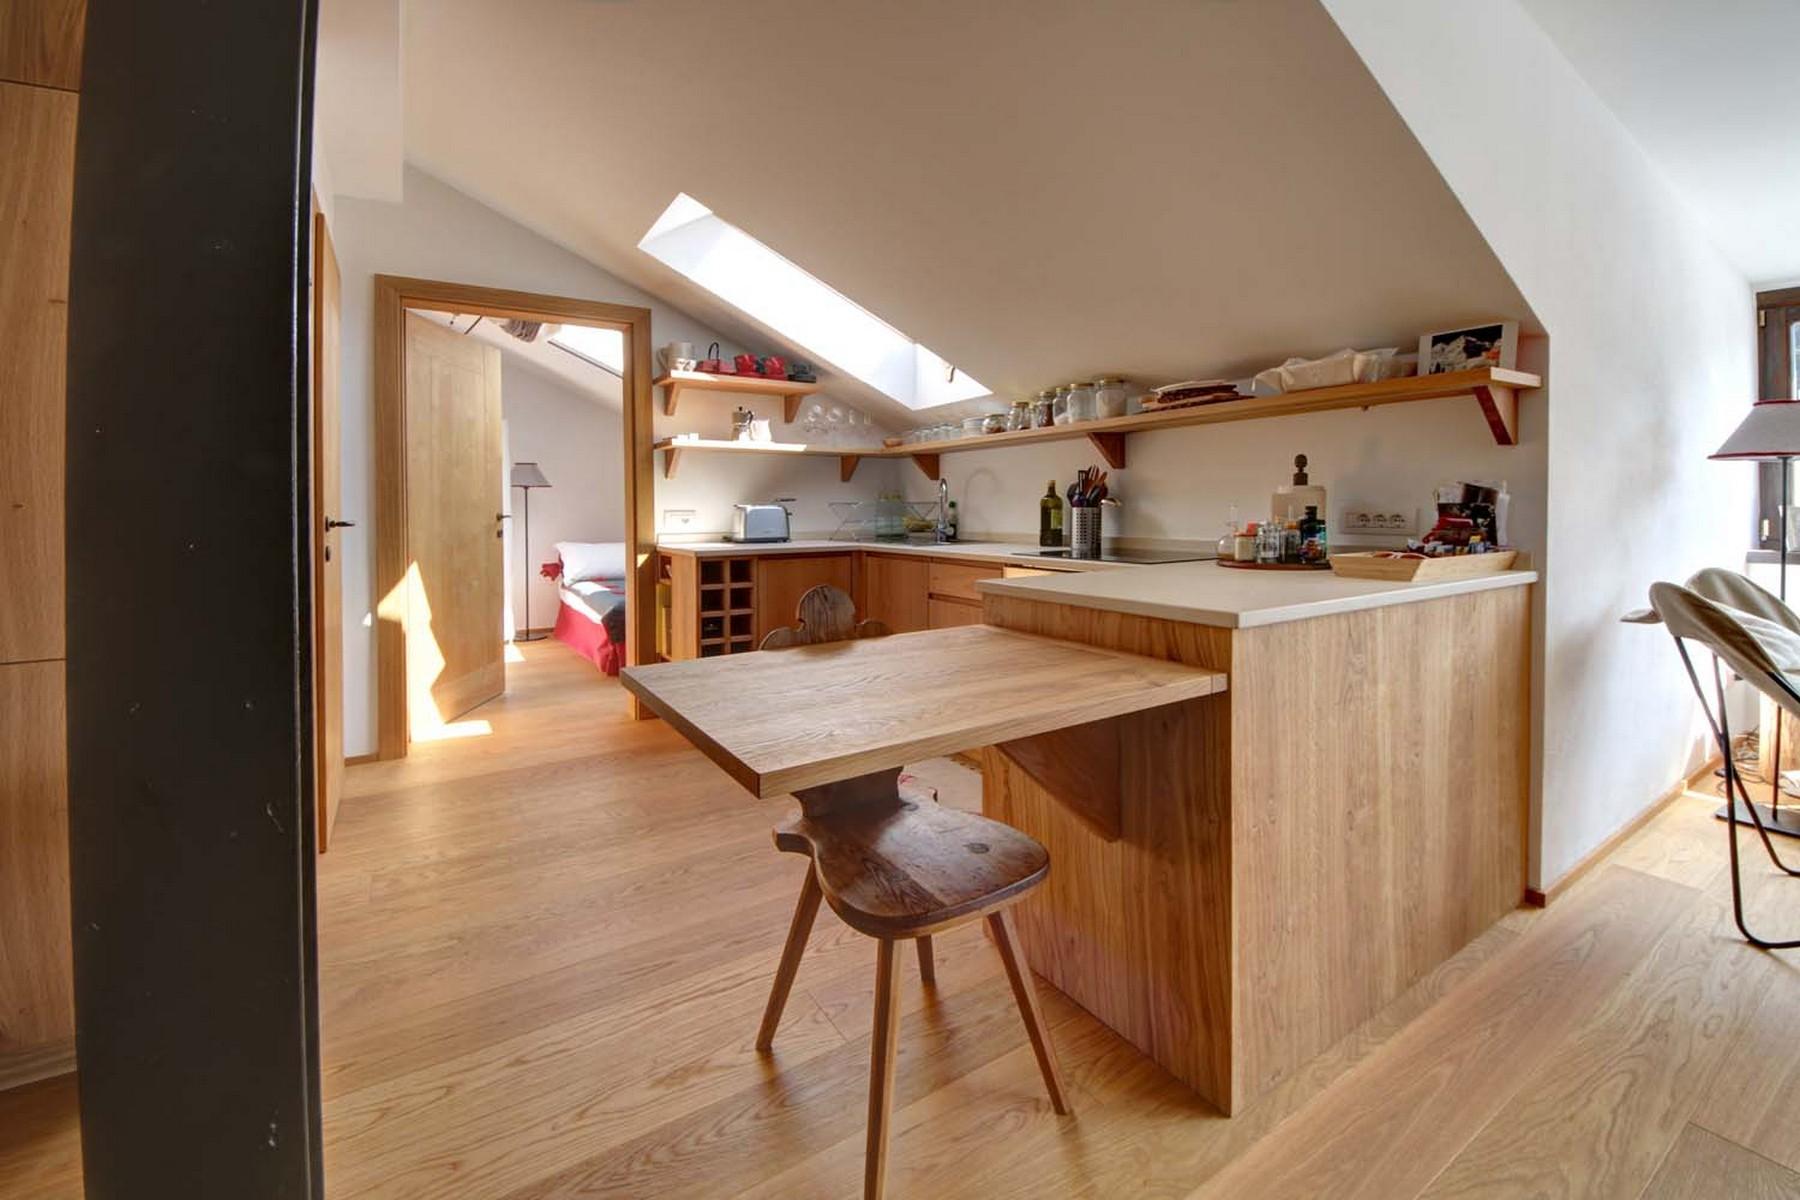 Additional photo for property listing at Enchanting apartment totally restore Dobbiaco Dobbiaco Toblach, Bolzano 39034 Italien